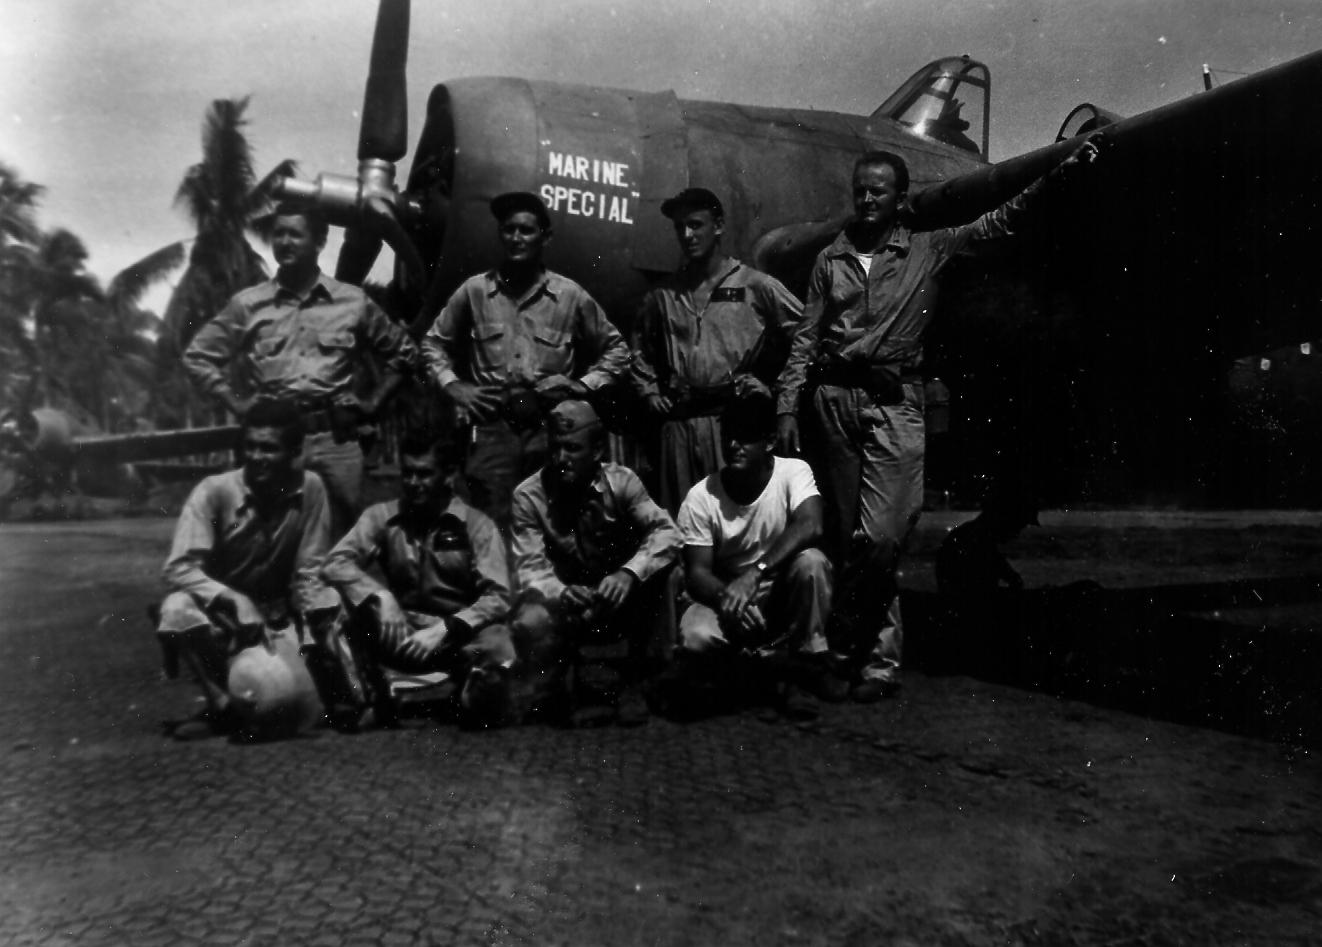 Grumman F4F 3 Wildcat named Marine Special Henderson Field Guadalcanal 1942 01